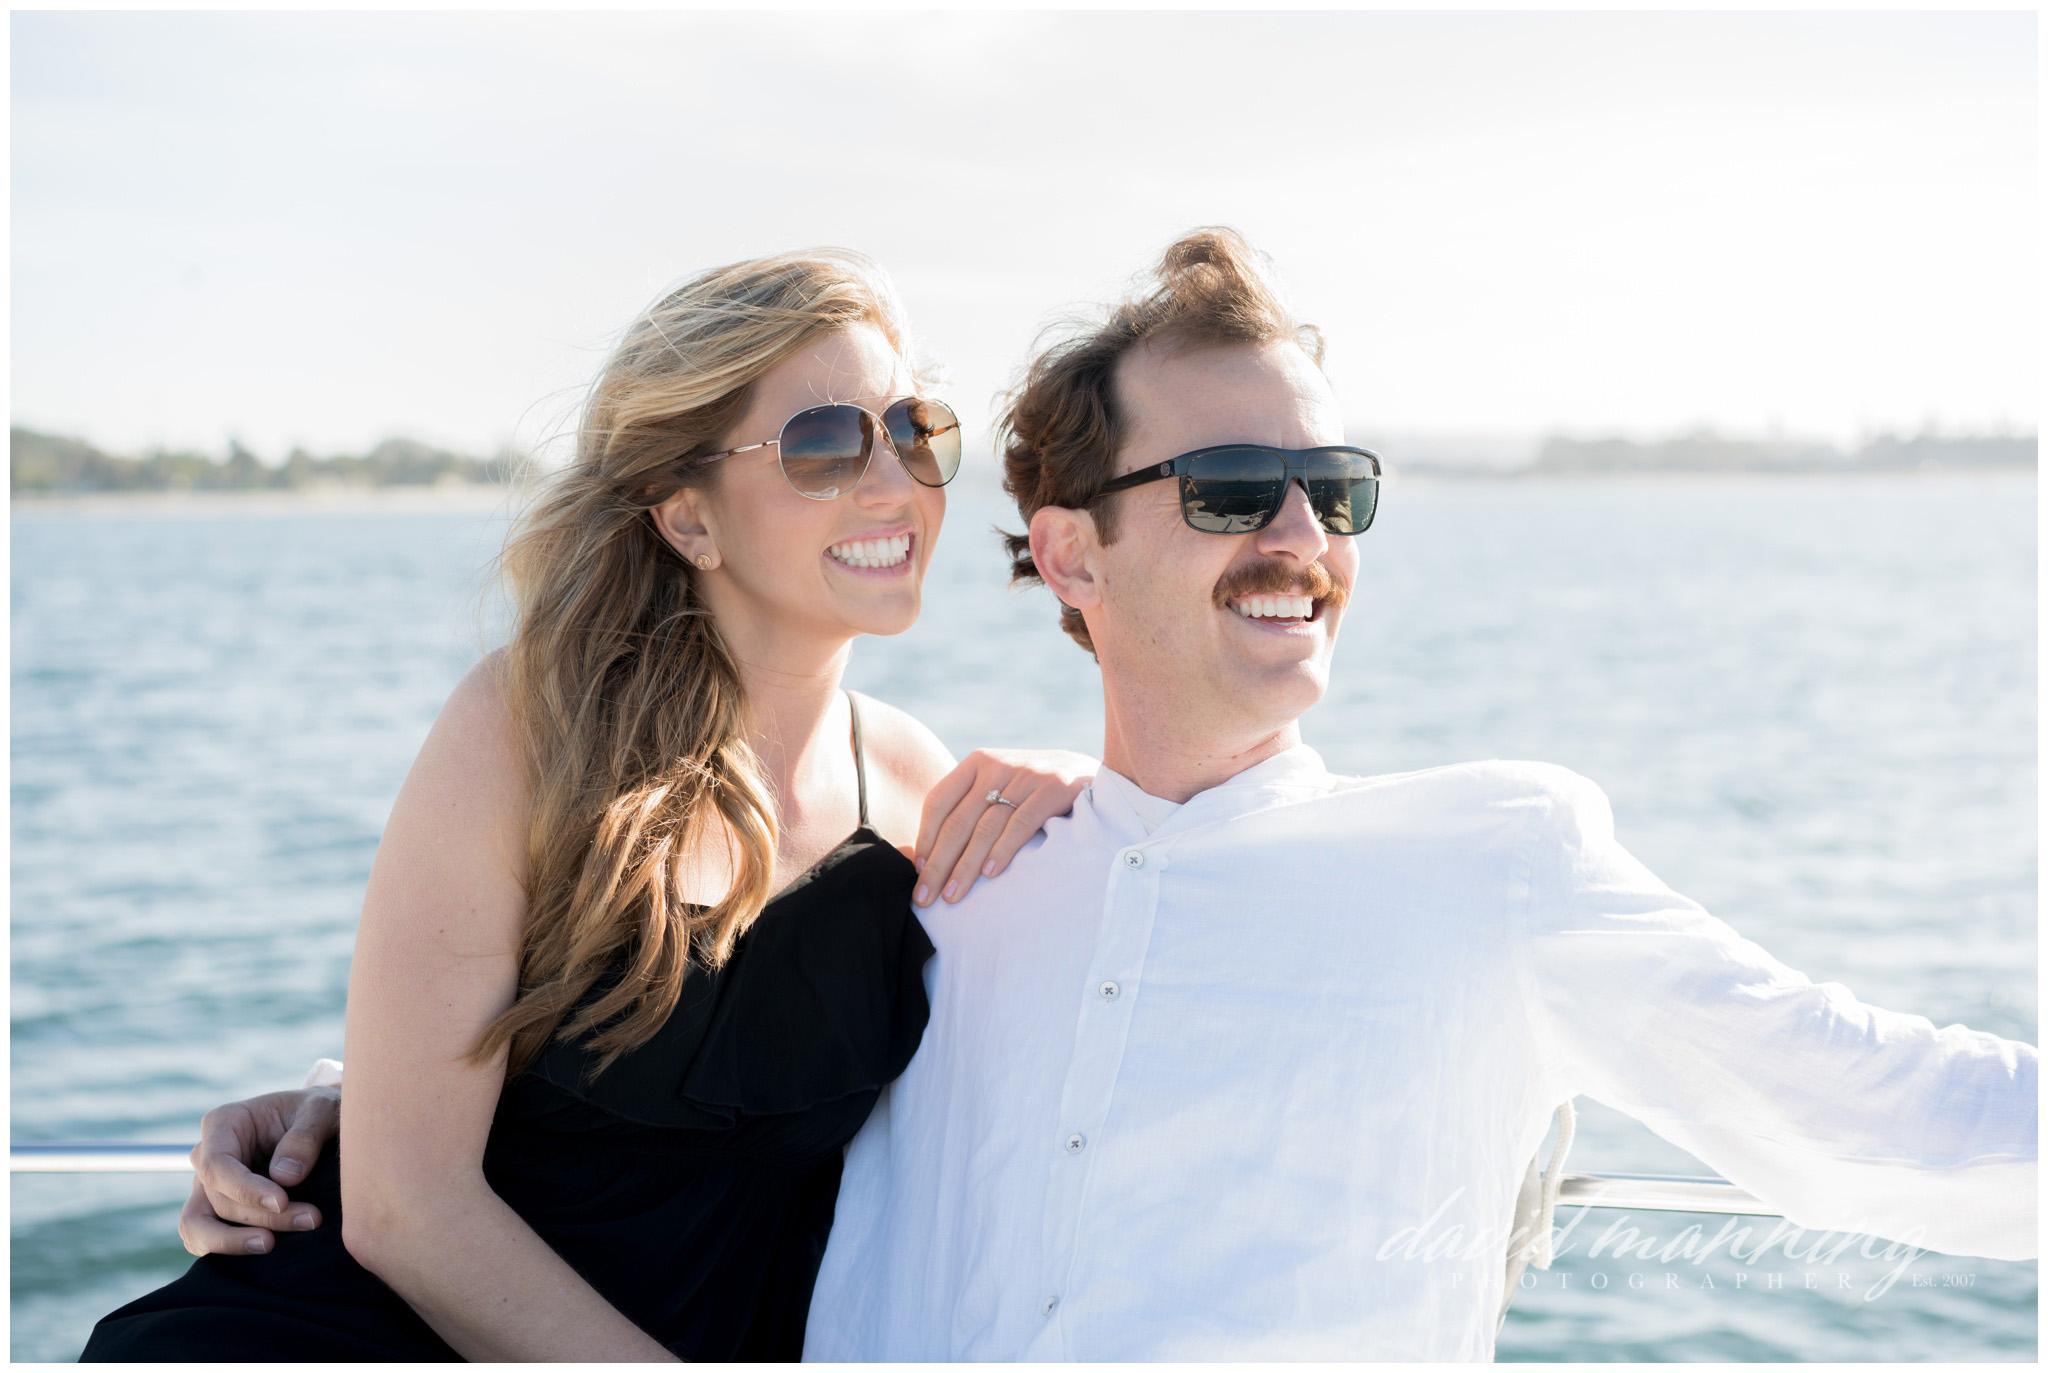 Alyssa-Taylor-Engagement-David-Manning-Photographer-0043.JPG